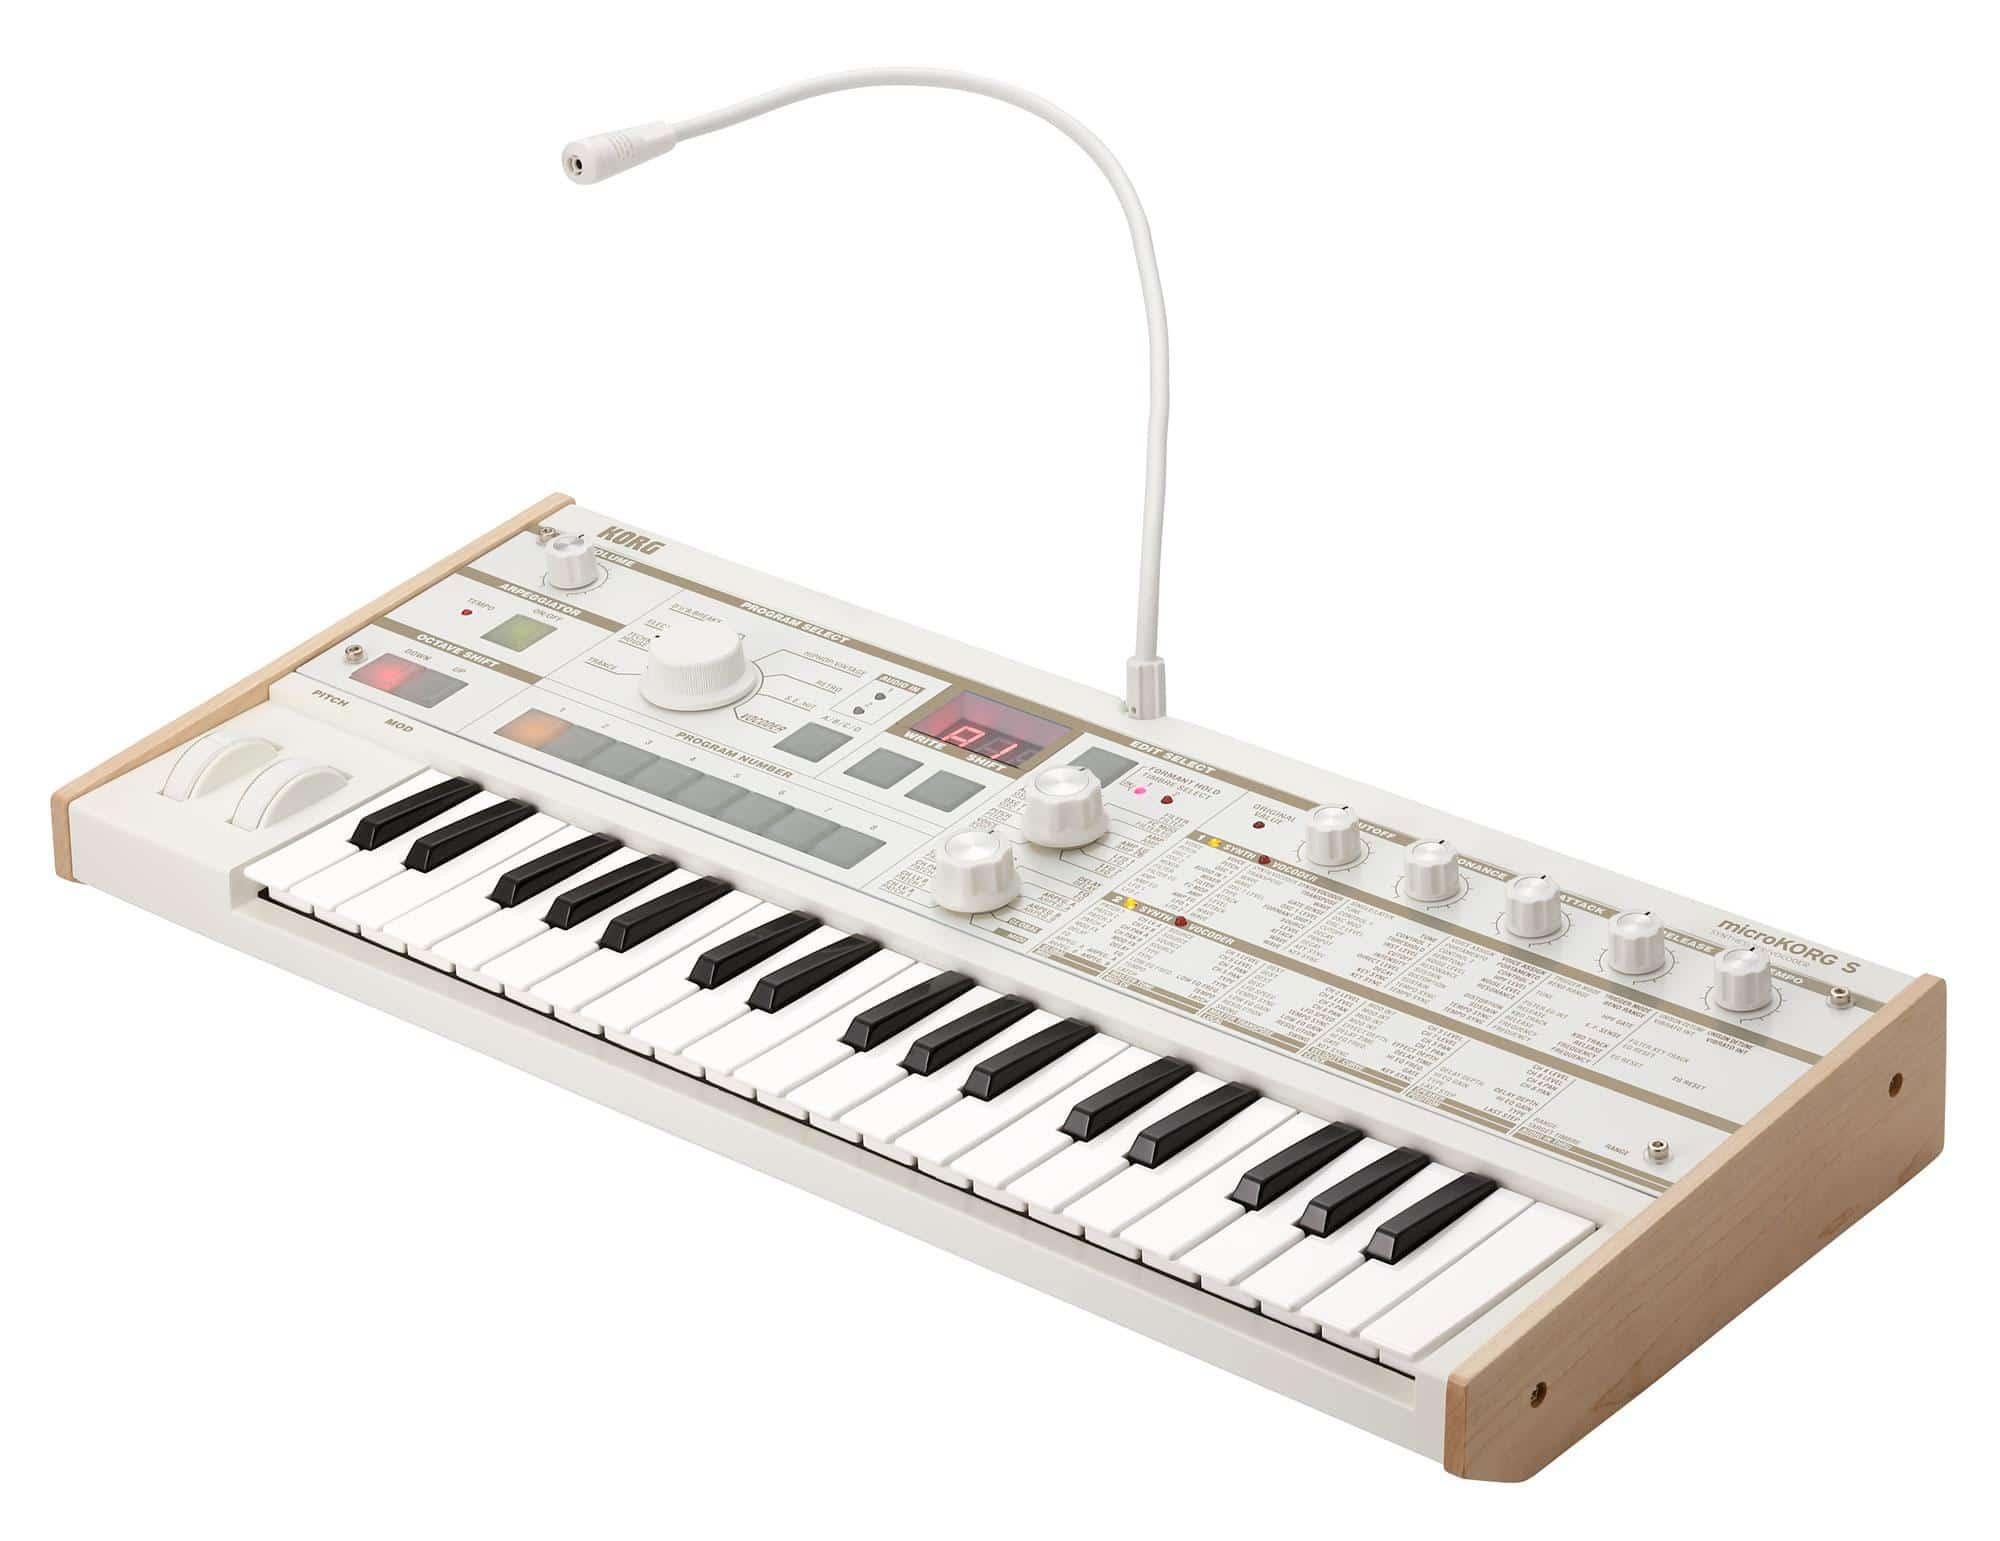 Synthesizer - Korg microKORG S - Onlineshop Musikhaus Kirstein